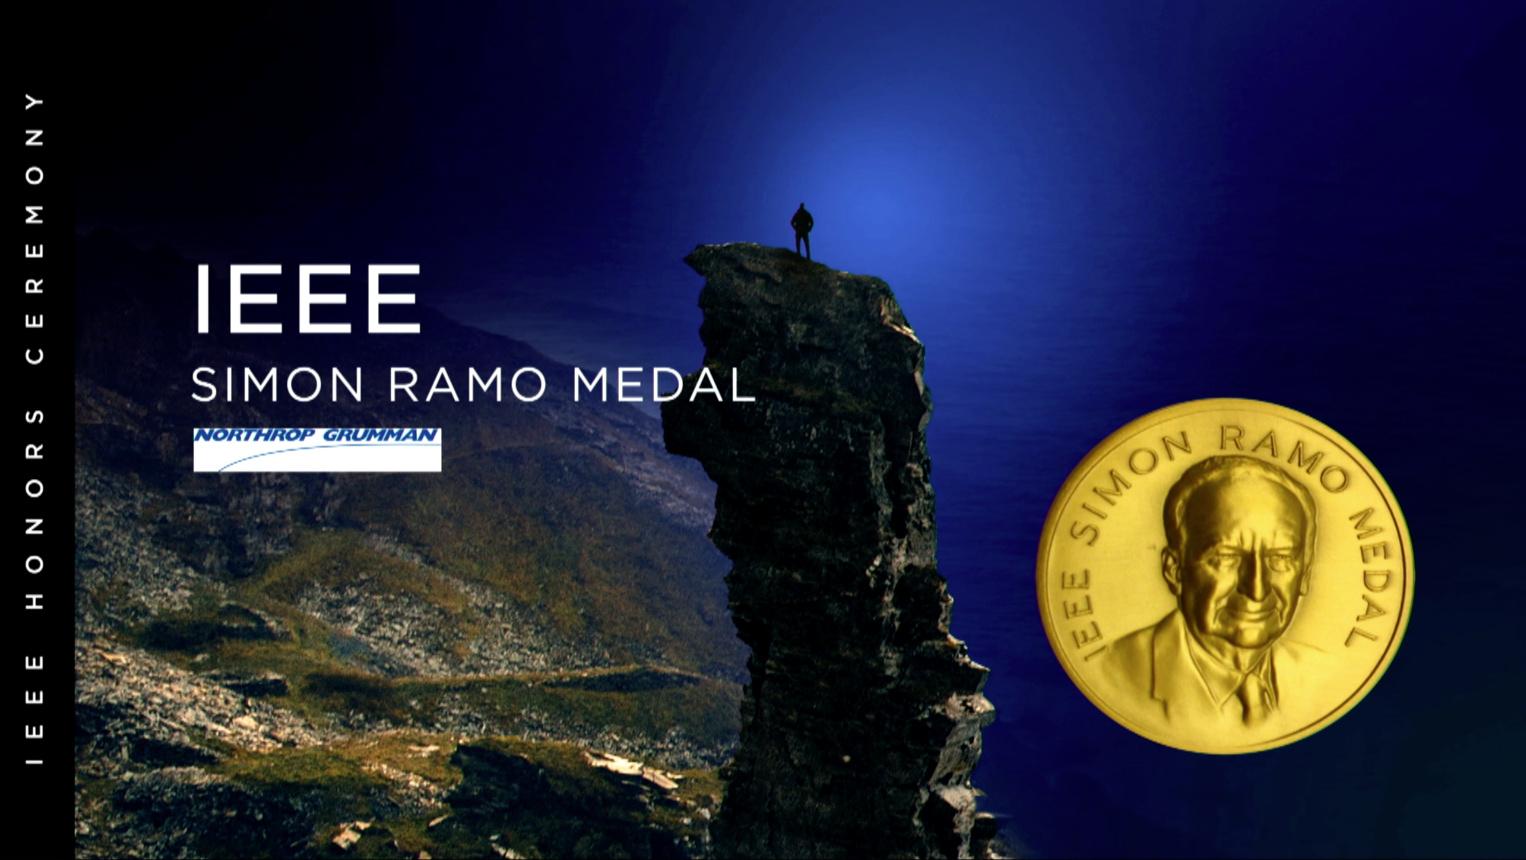 IEEE Simon Ramo Medal - Heinz Stoewer - 2018 IEEE Honors Ceremony